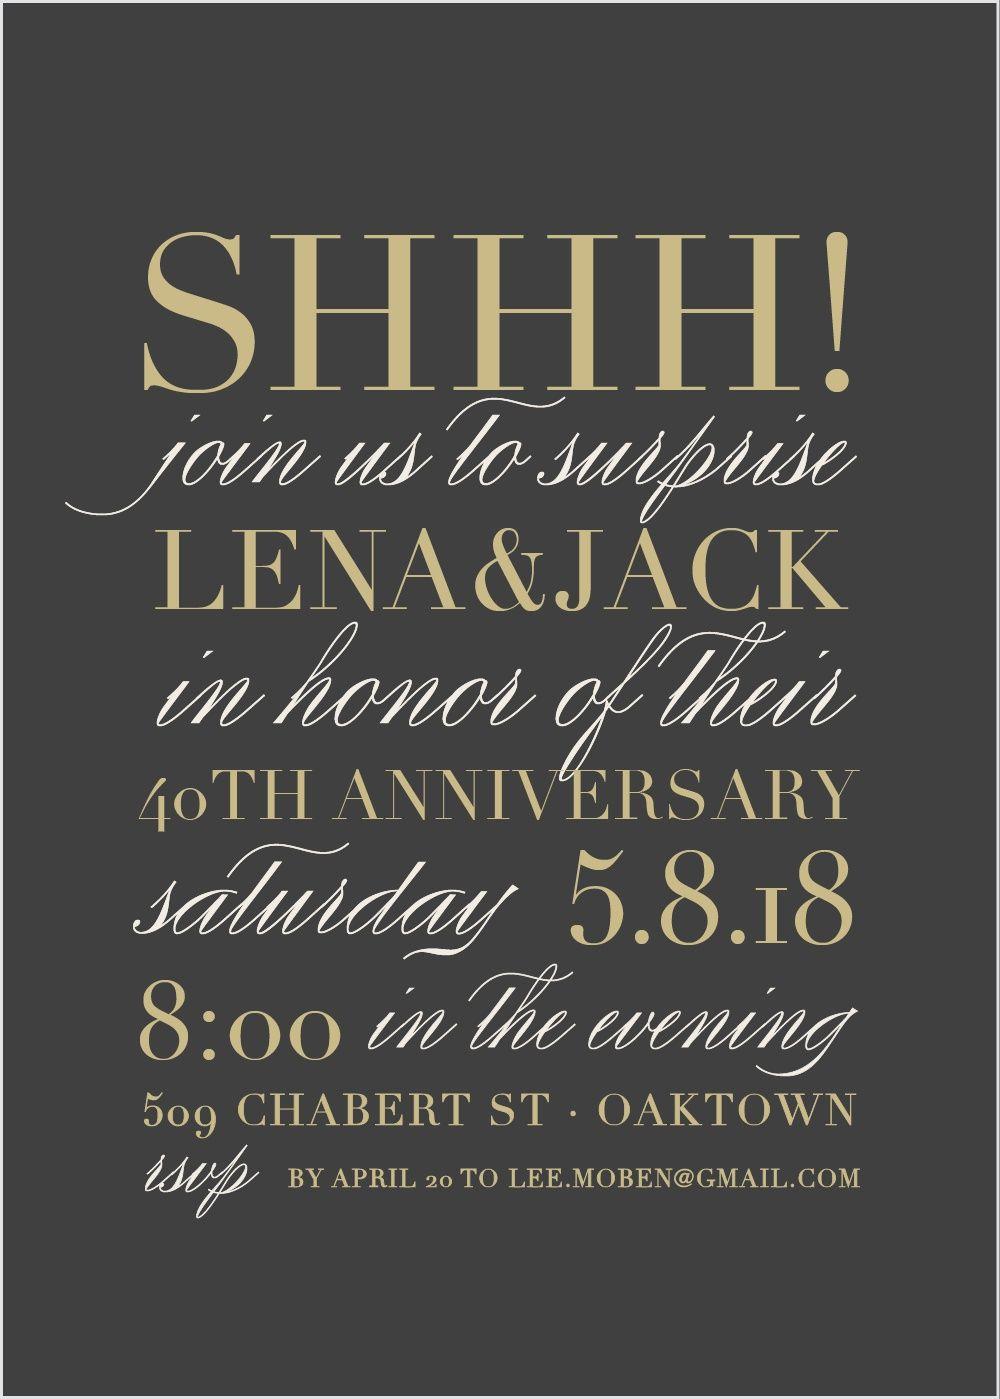 elegant surprise anniversary party invitations in 2018 anniversary